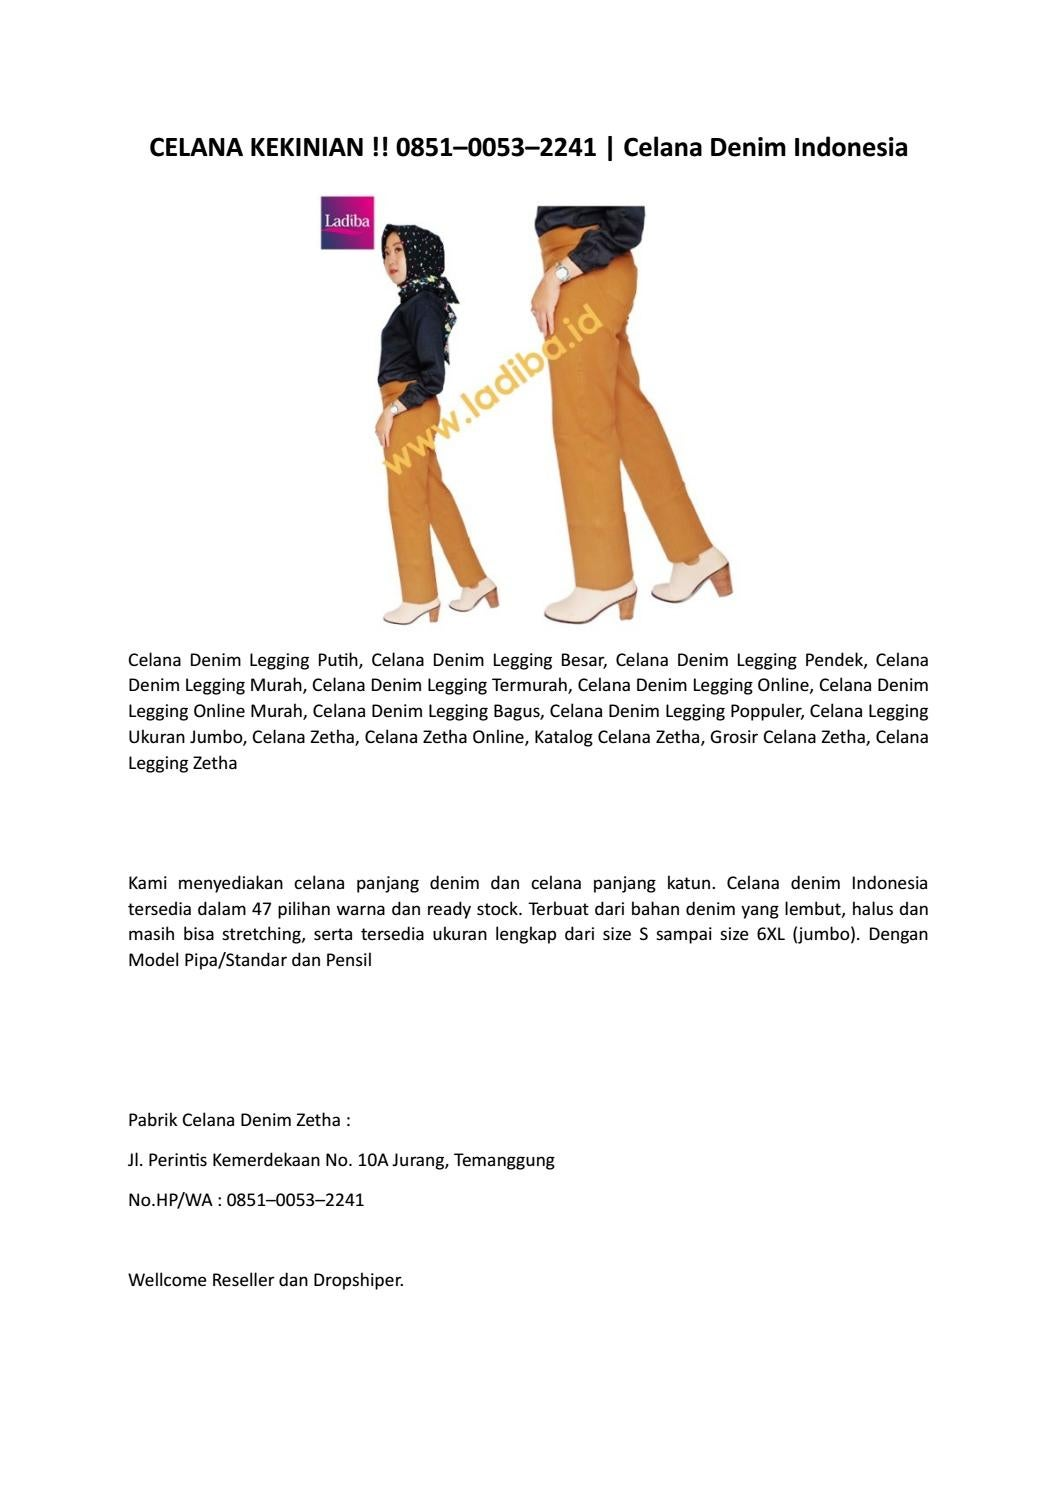 Celana Kekinian 0851 0053 2241 Celana Denim Indonesia By Celana Denim Wanita 0851 0053 2241 Issuu